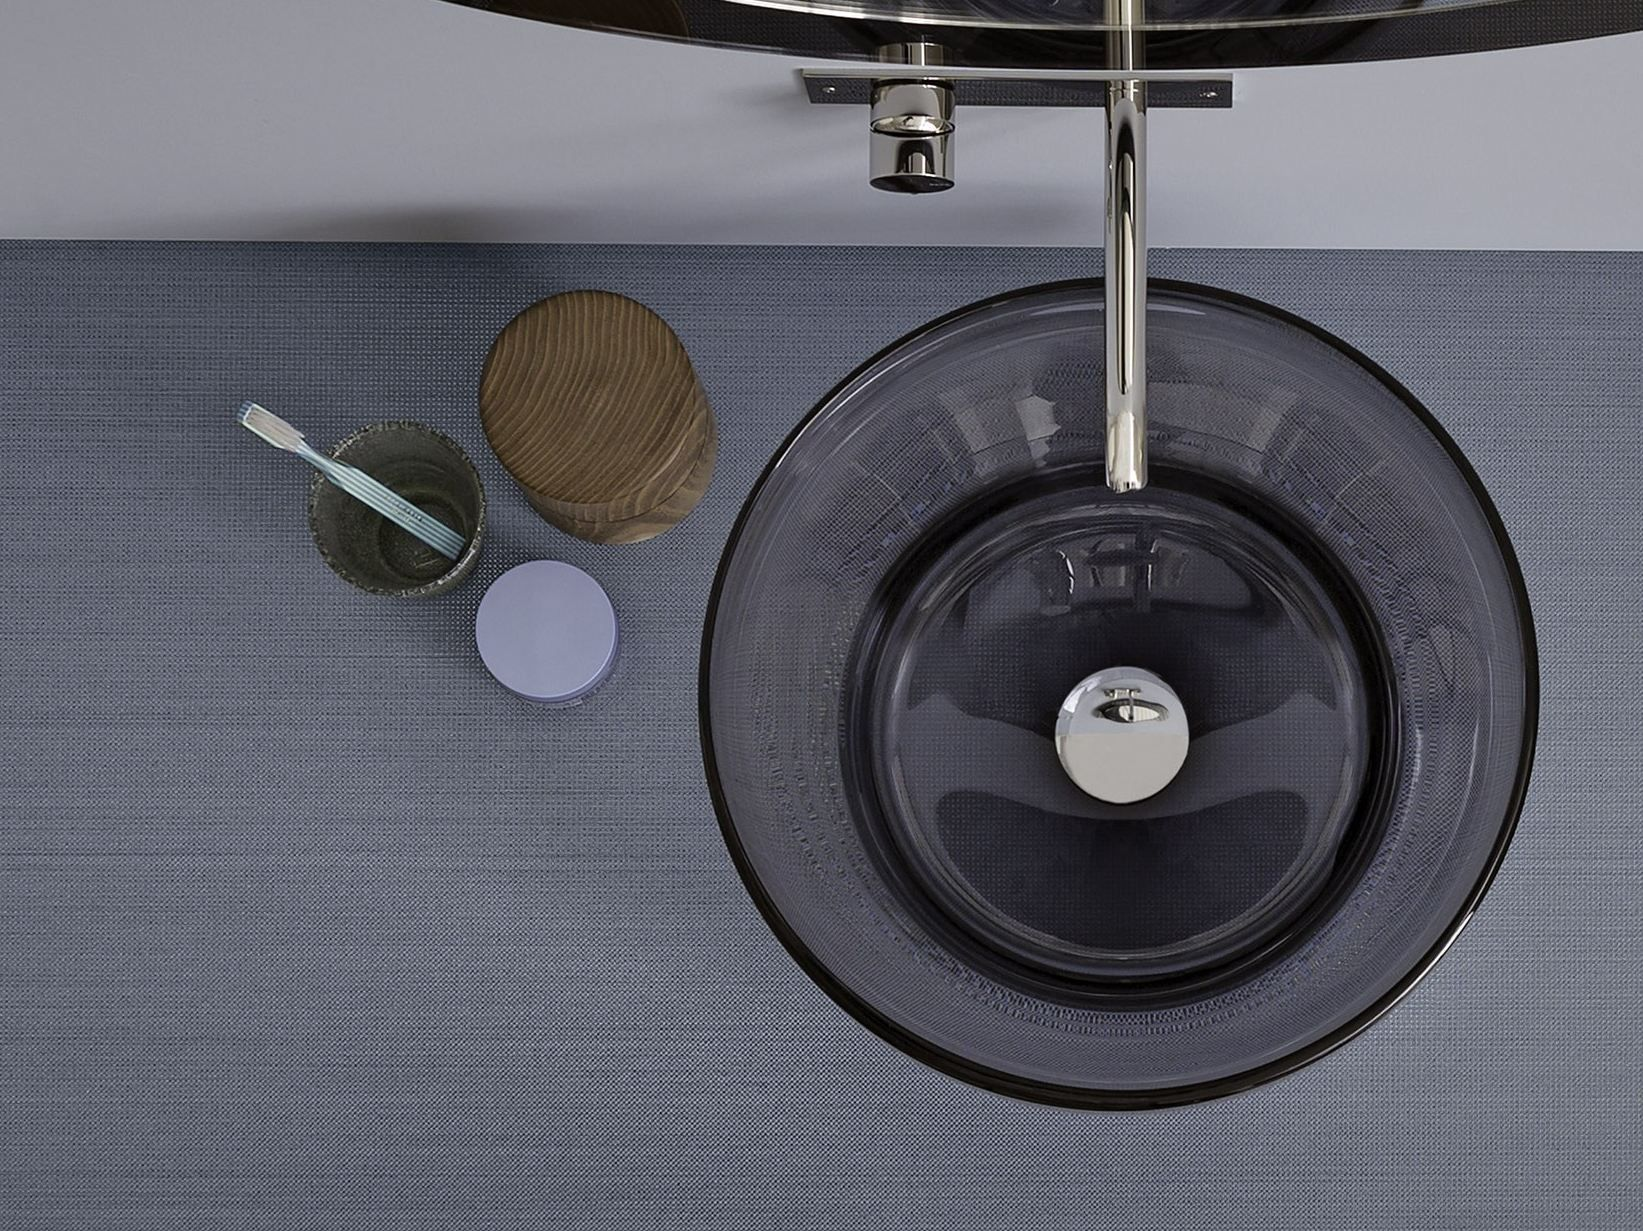 Countertop Murano glass washbasin MURANO - Rexa Design | Guest ...